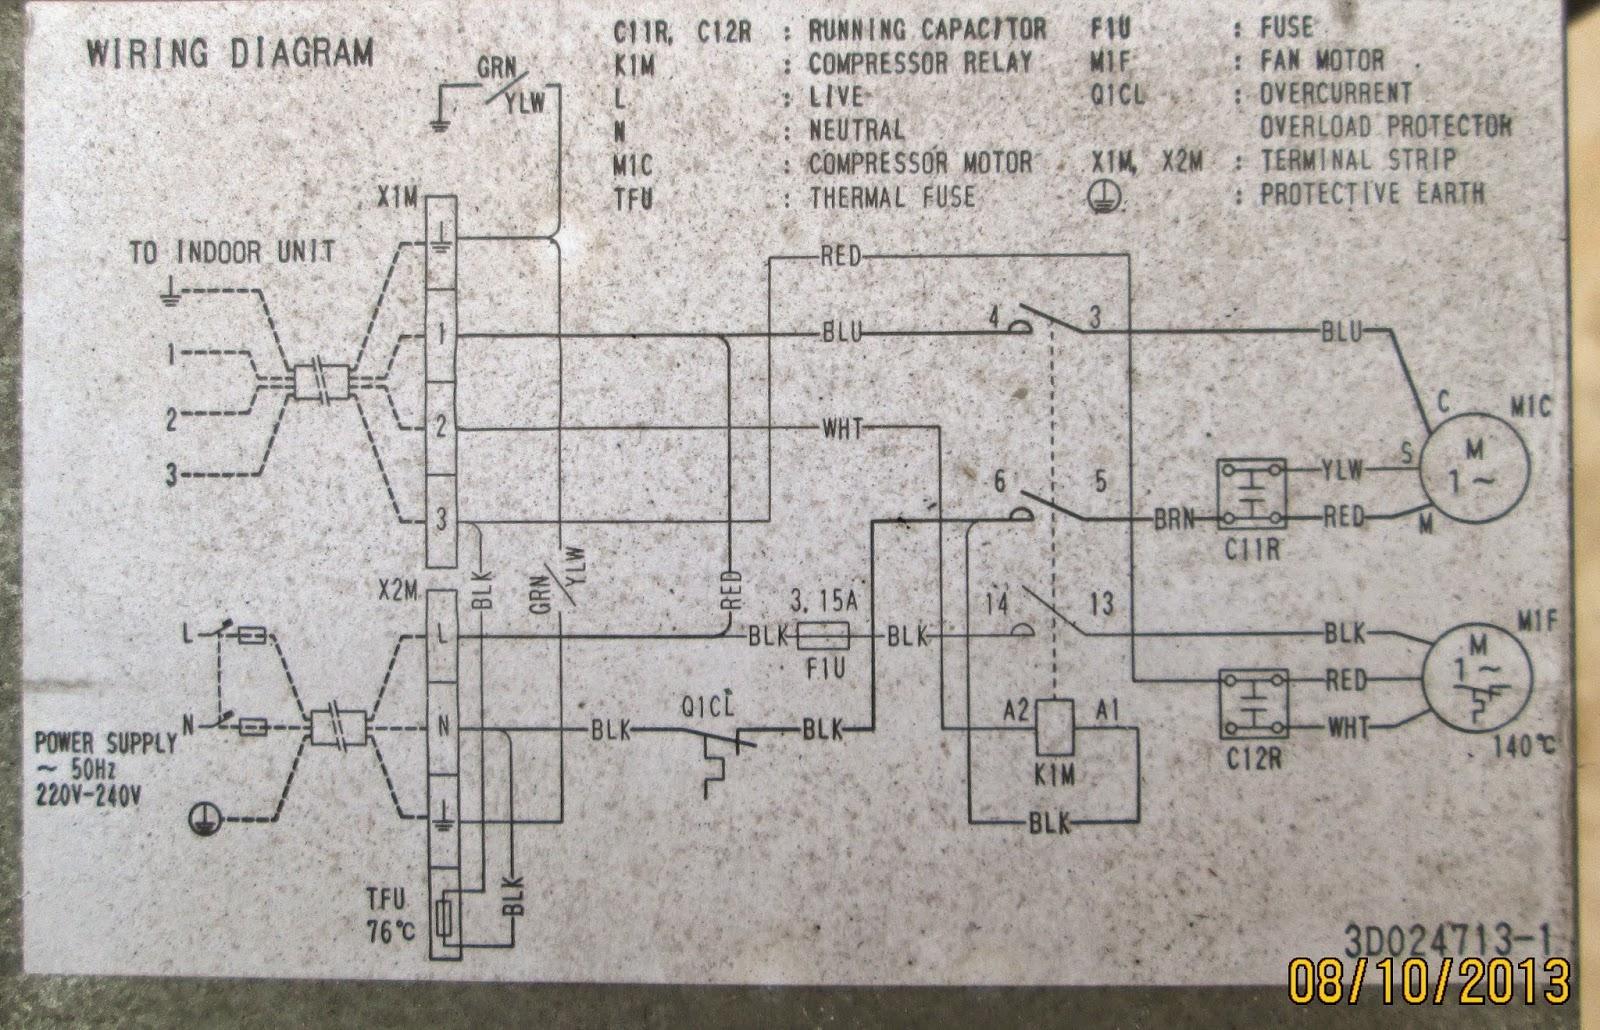 Wiring-diagram-outdoor-ac-split & Split Ac Wiring Diagram Of ...